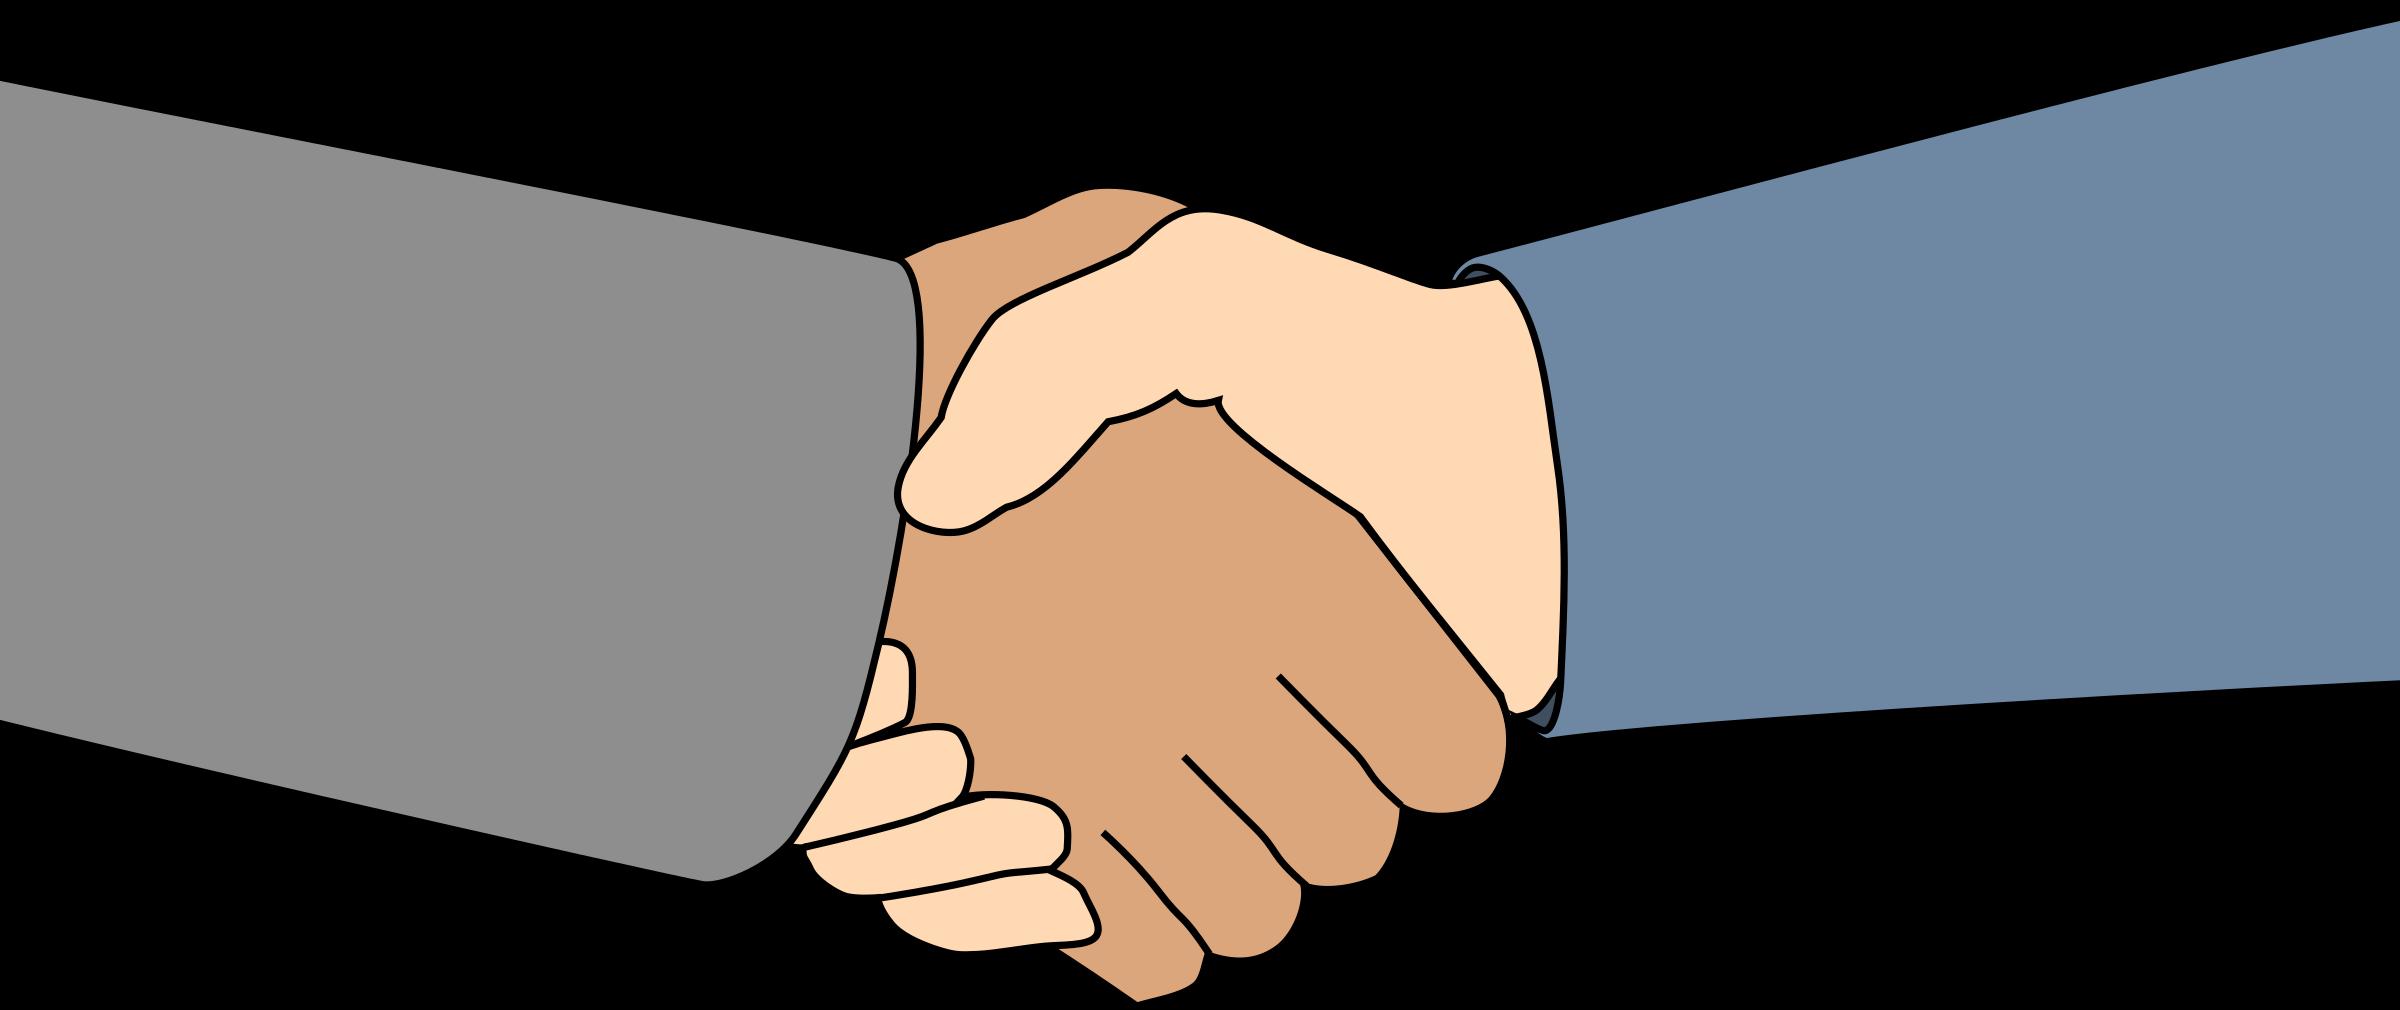 2400x1010 Clipart Of Handshakes